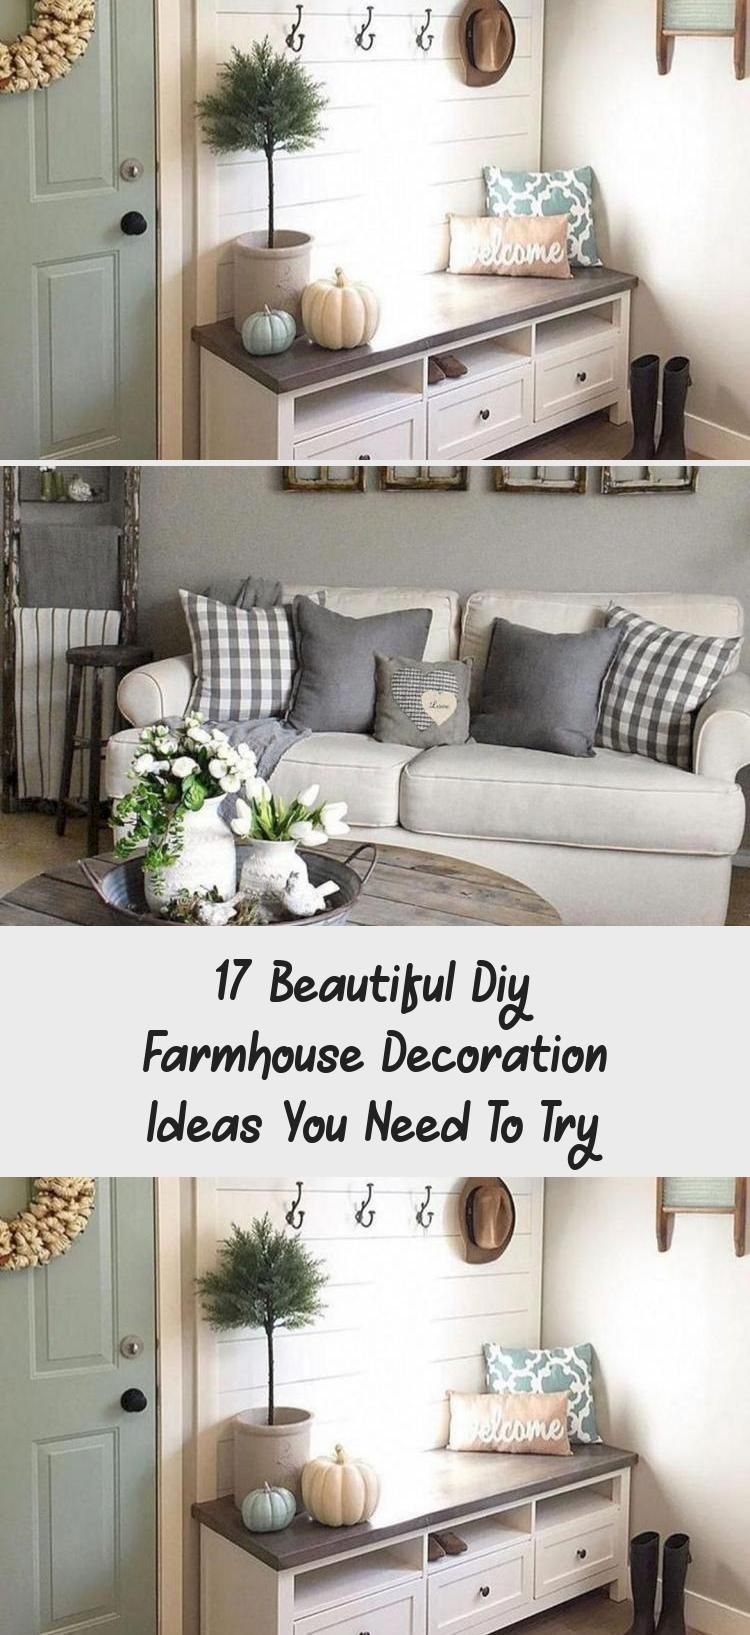 17 Beautiful Diy Farmhouse Decoration Ideas You Need To Try In 2020 With Images Farmhouse Diy Diy Farmhouse Decor Kitchen Decor